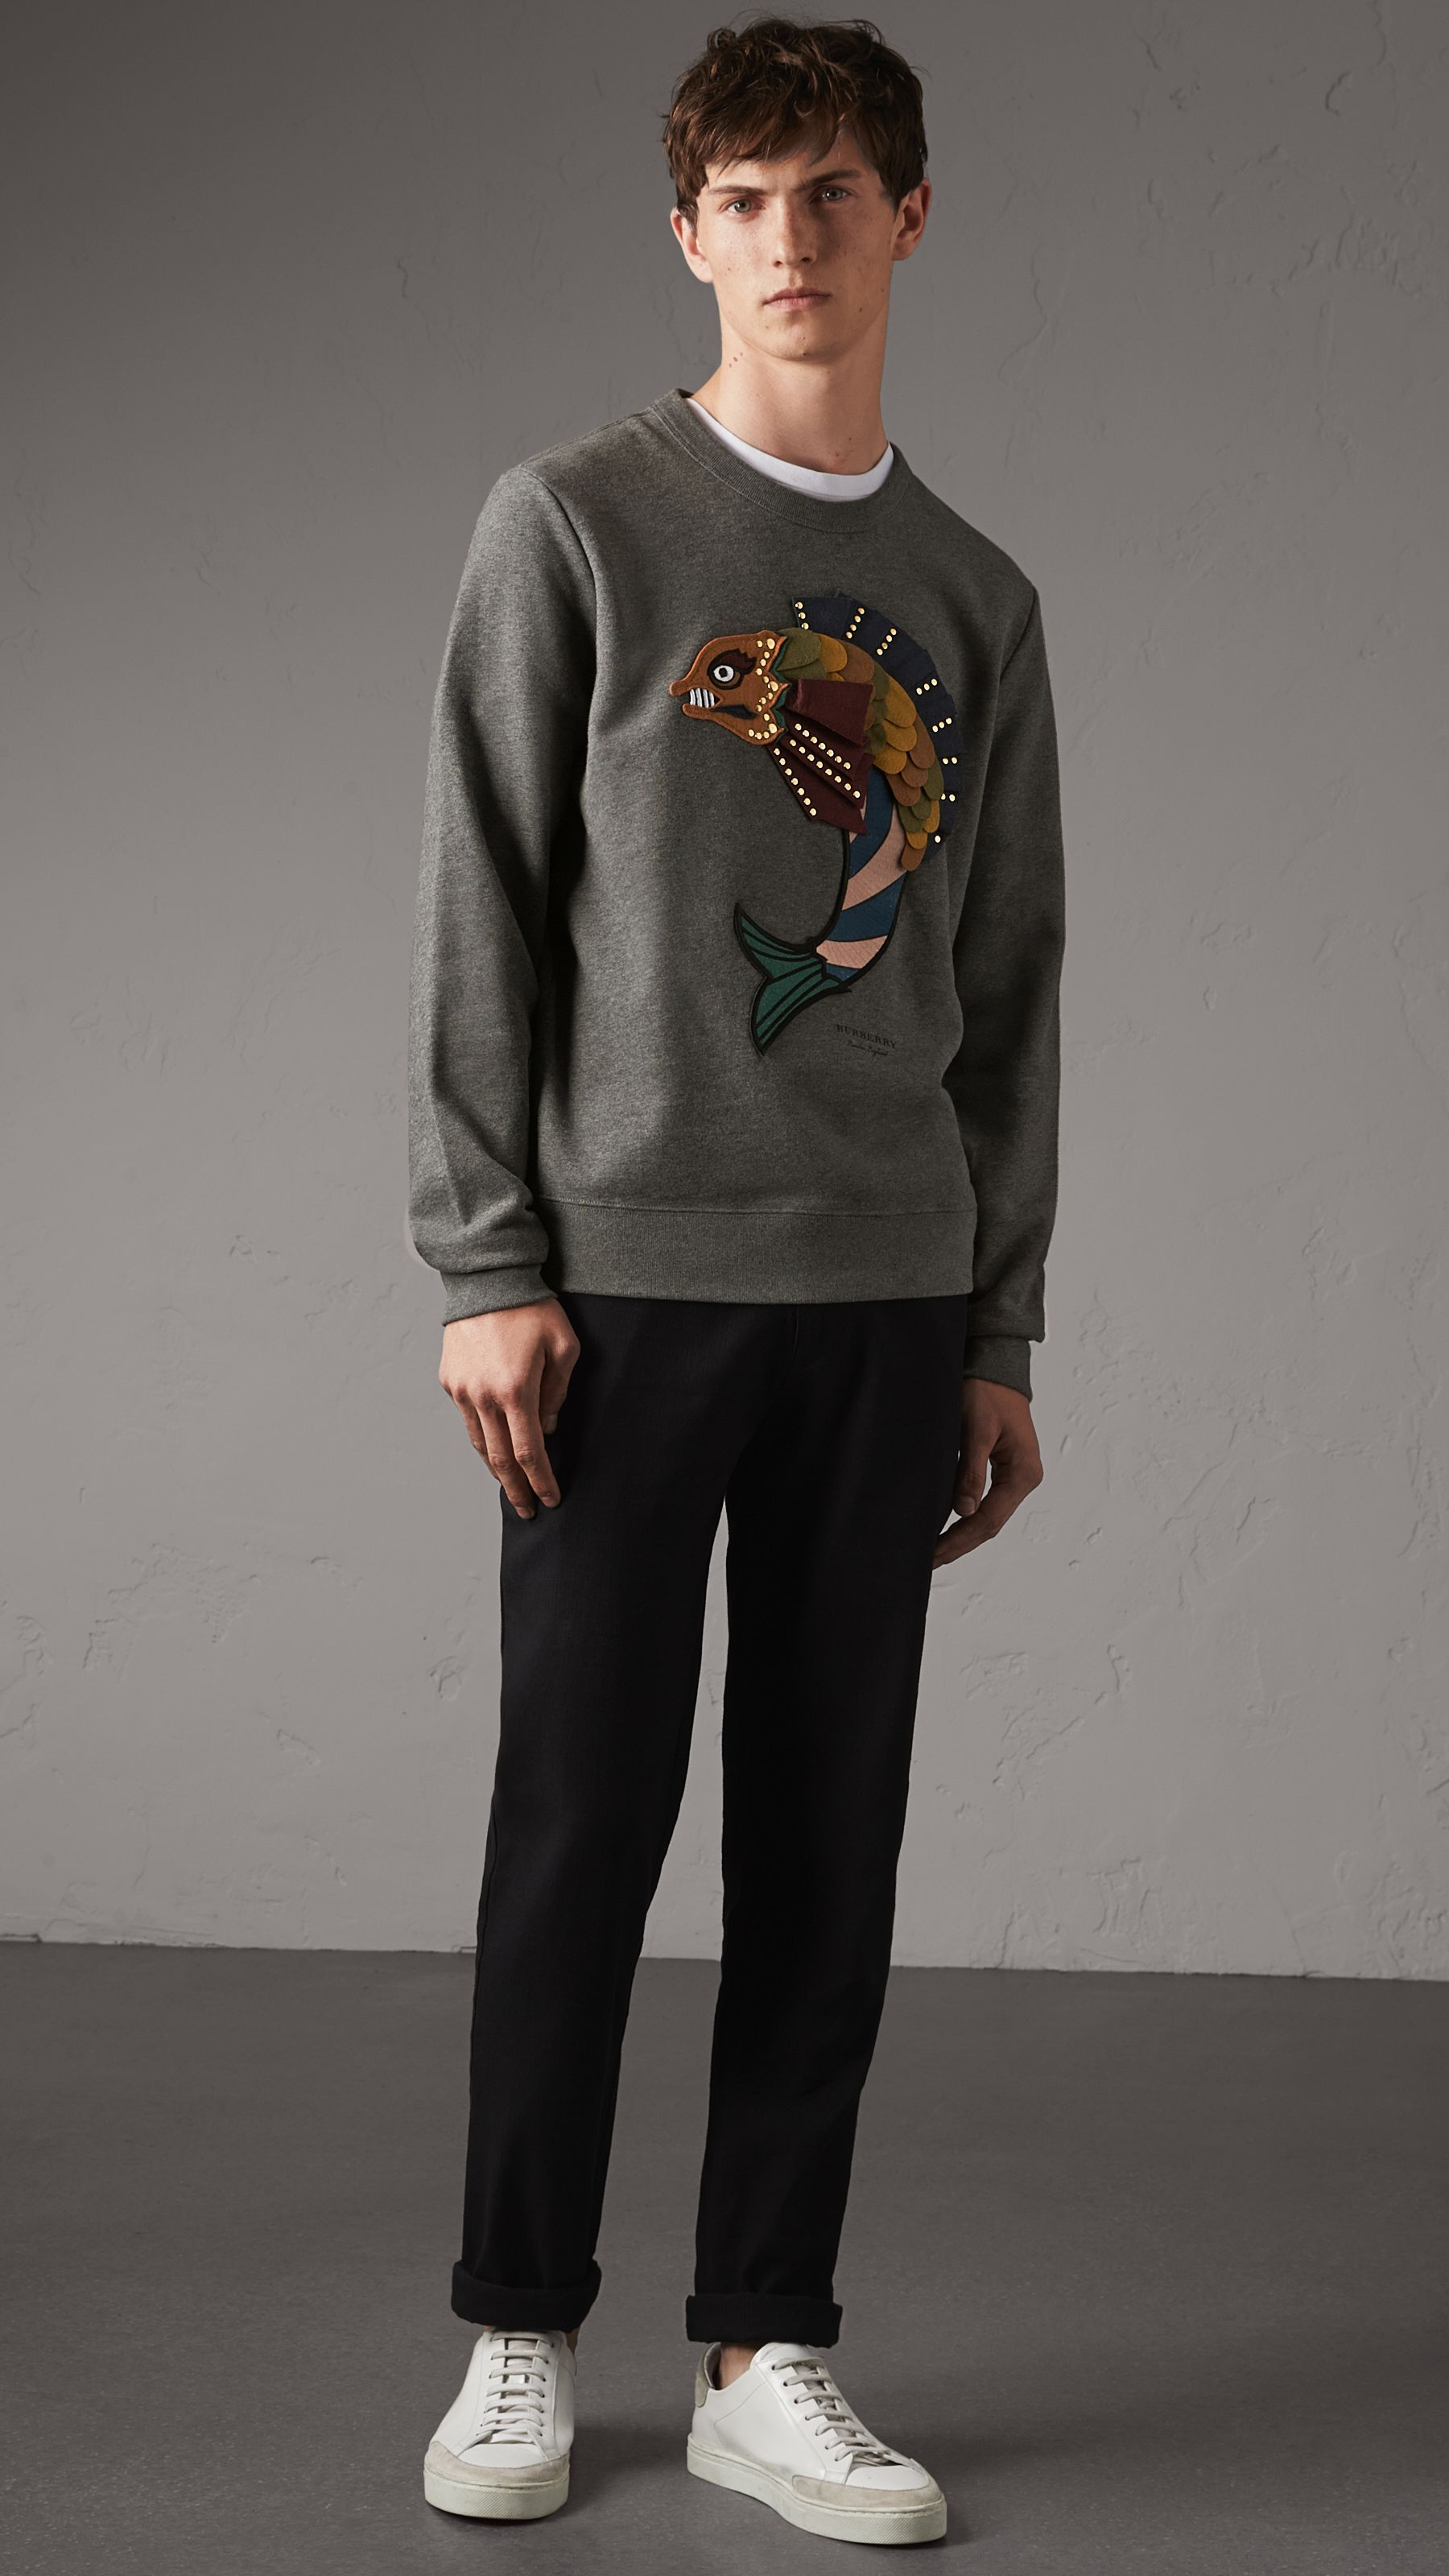 Beasts Applique Cotton Sweatshirt In Mid Grey Melange Men Burberry United States Men Street Fashion Cotton Sweatshirts Sweatshirts [ 3200 x 1800 Pixel ]